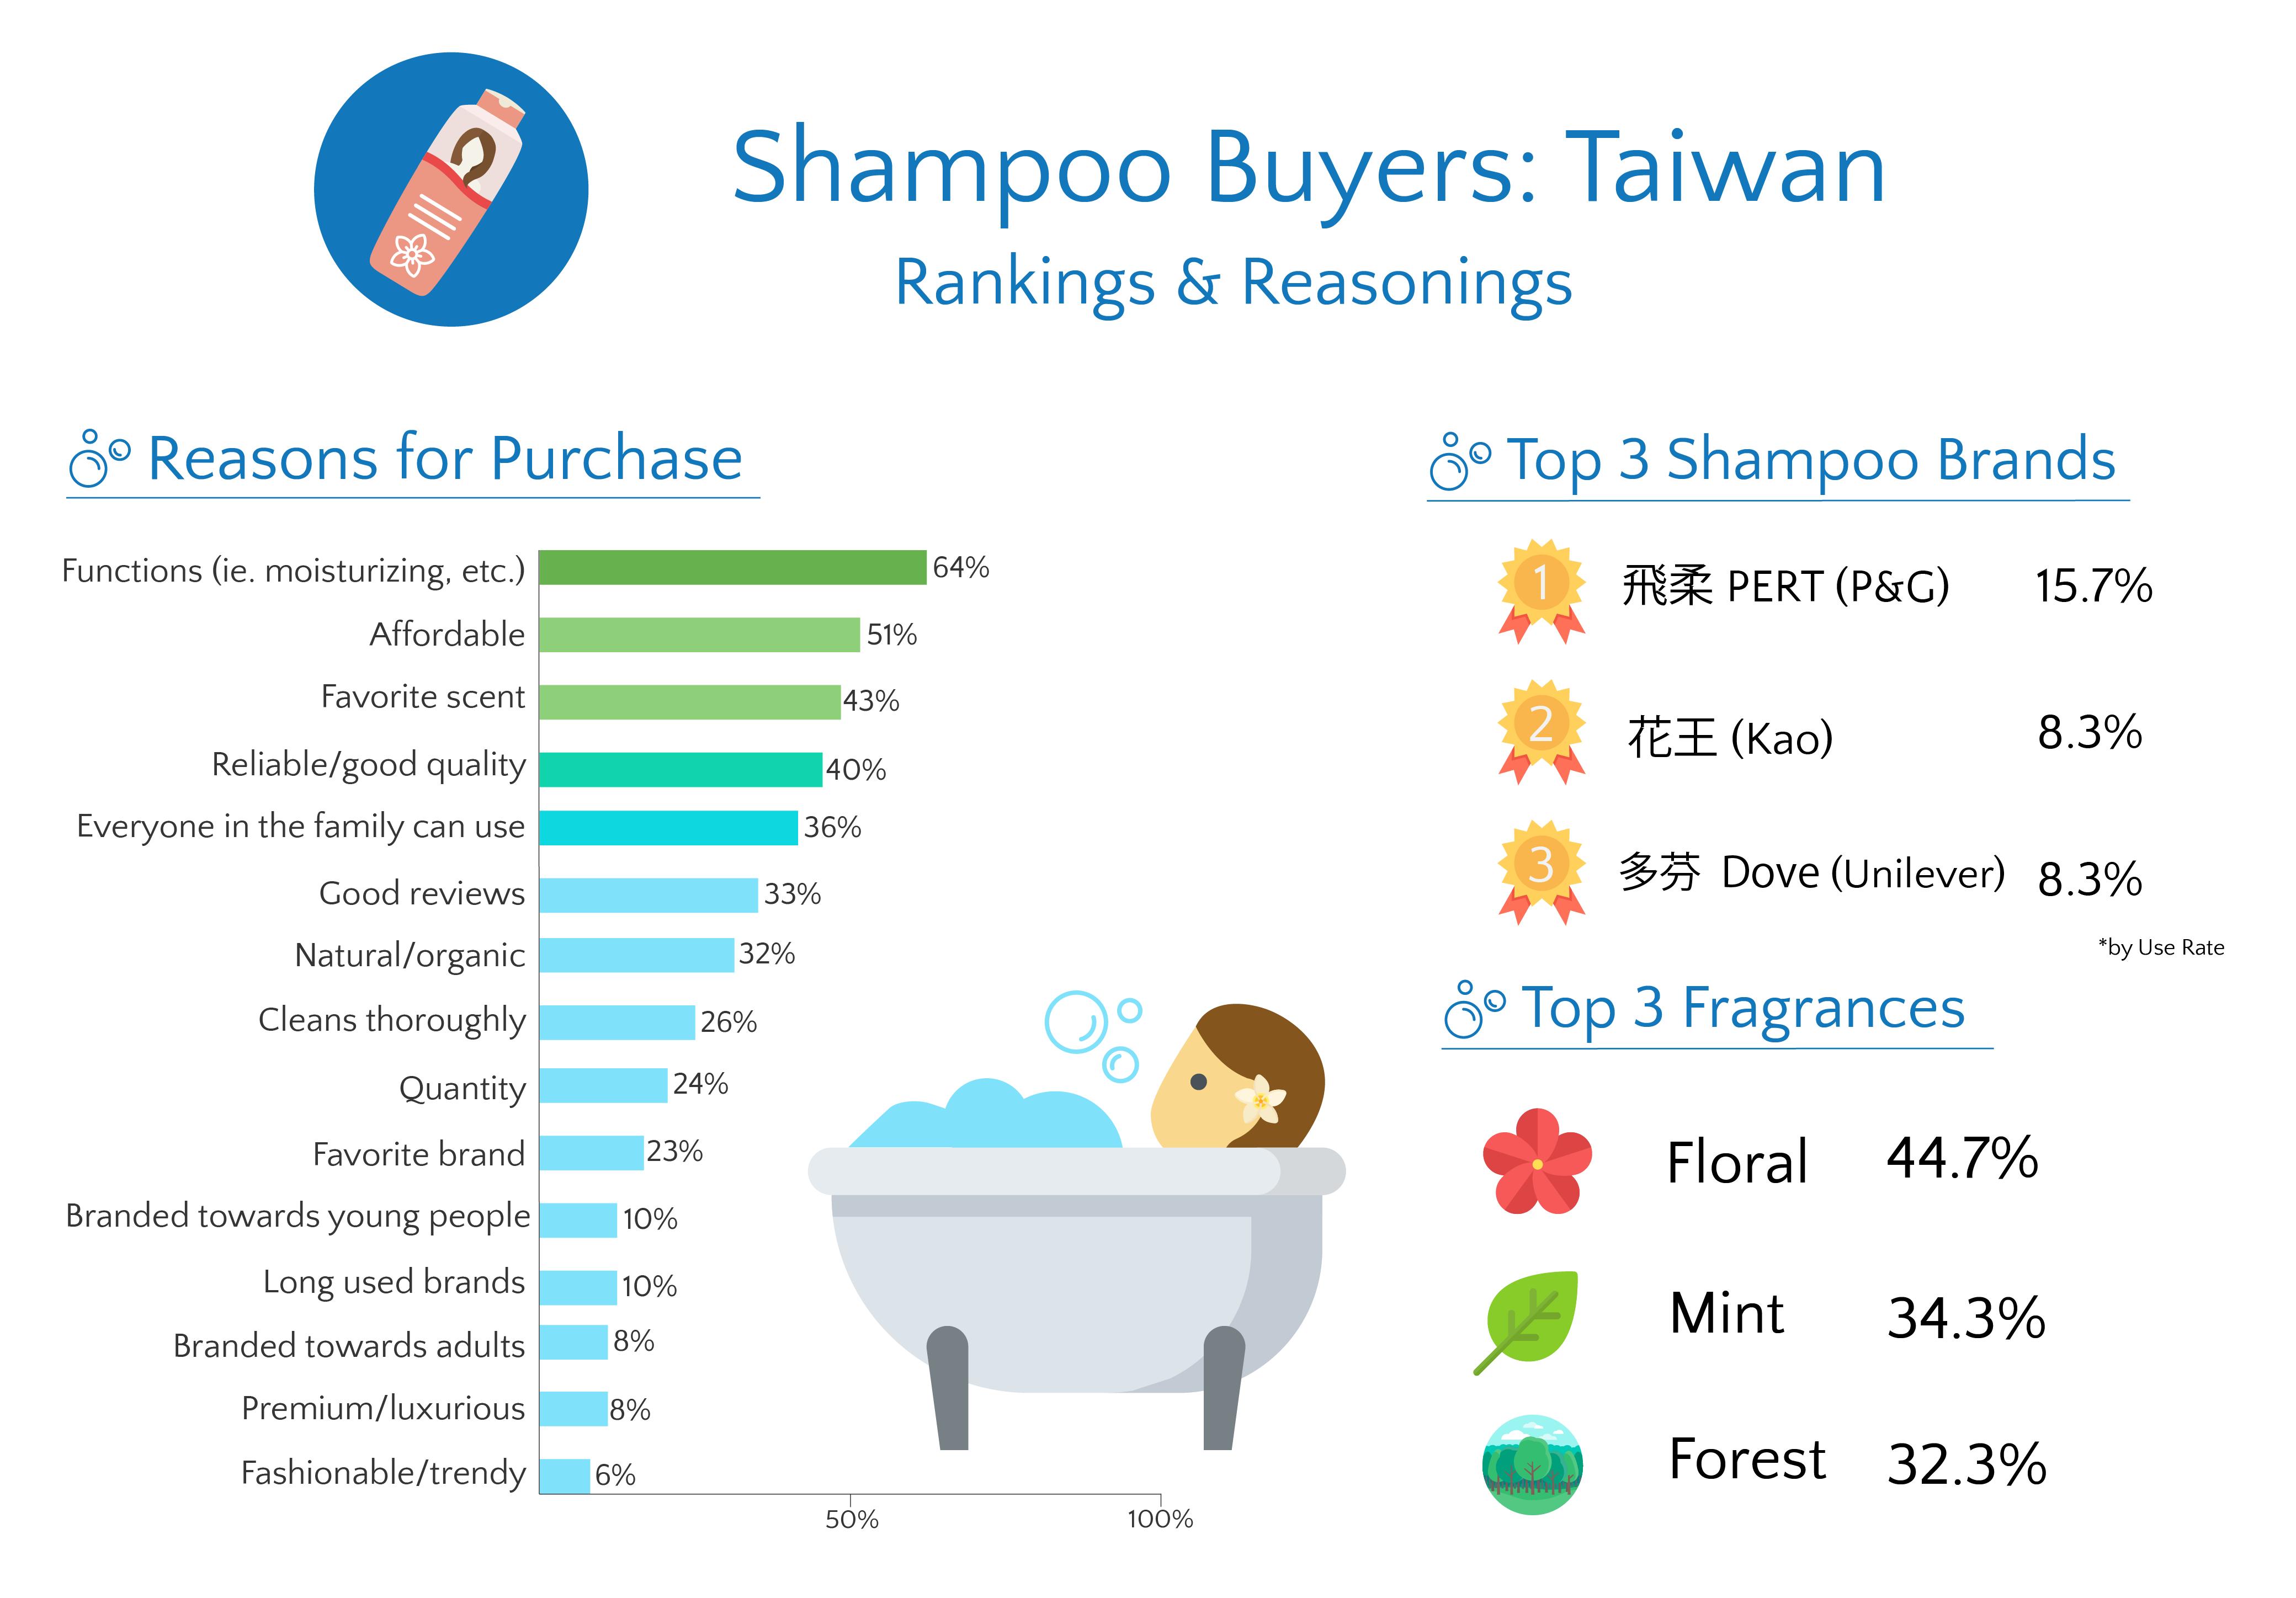 Taiwan Shampoo Infographic rankings & reasonings